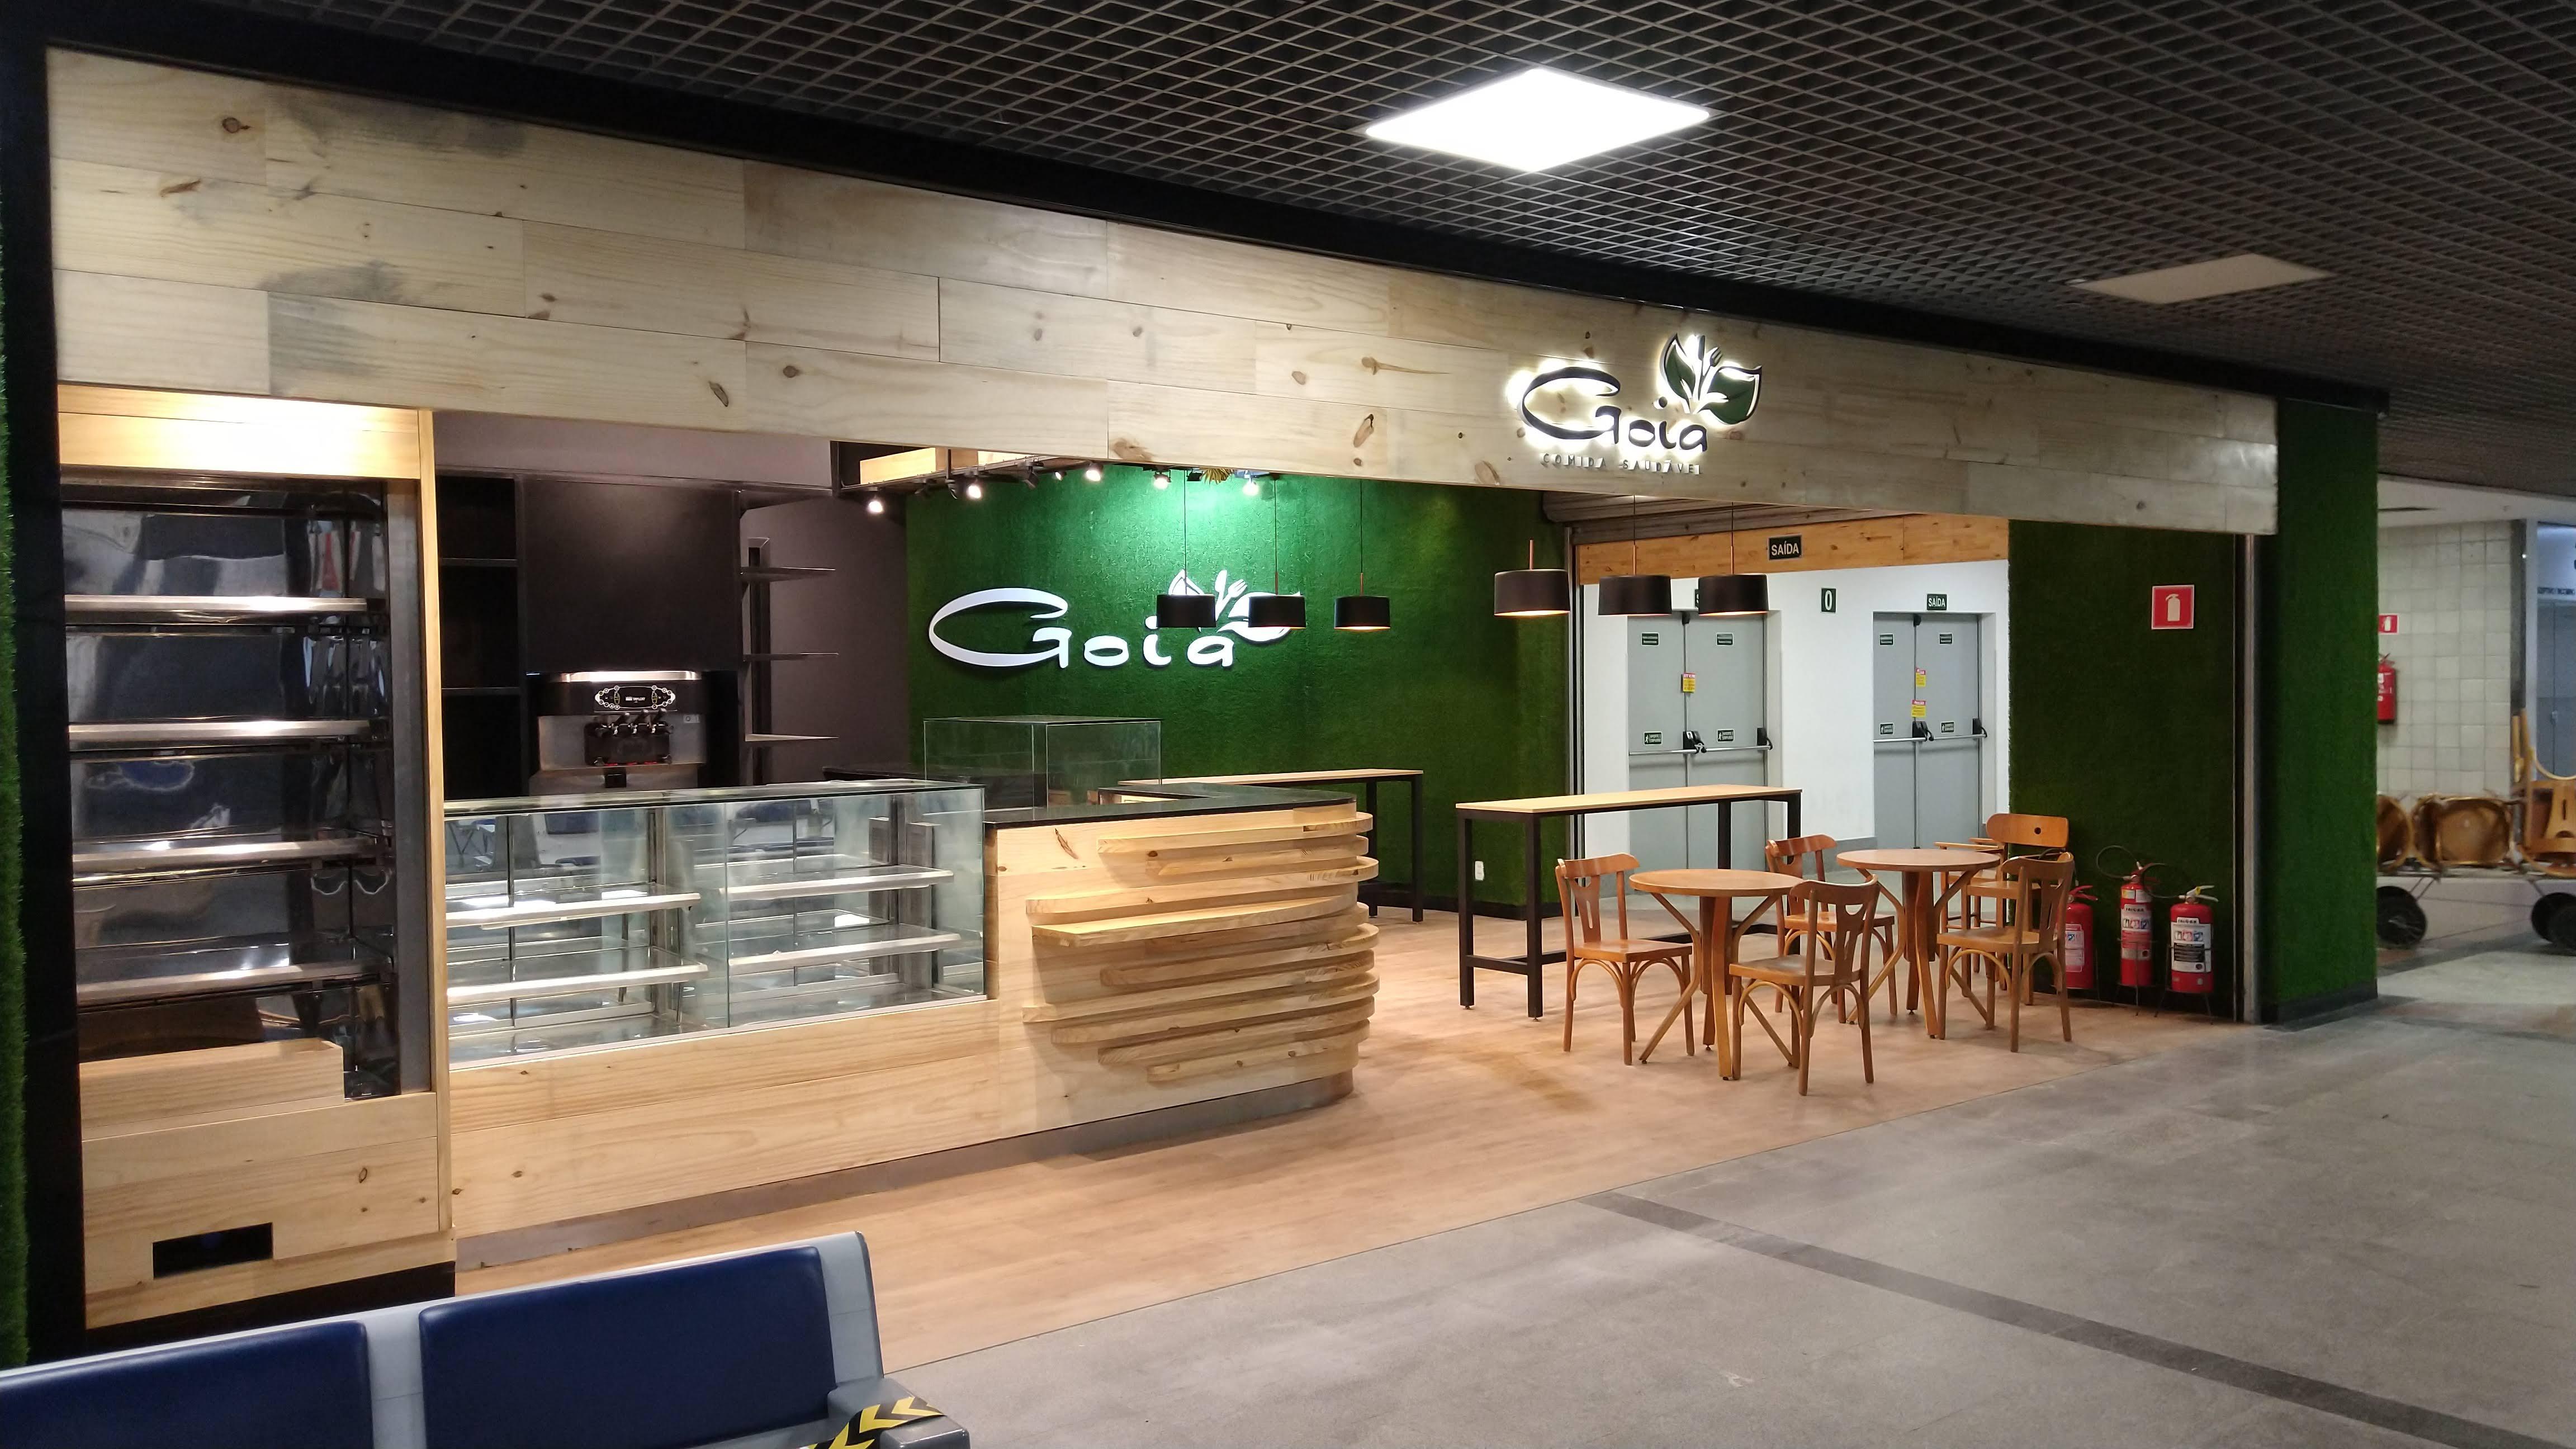 Restaurante GOIA Comida Saudavel